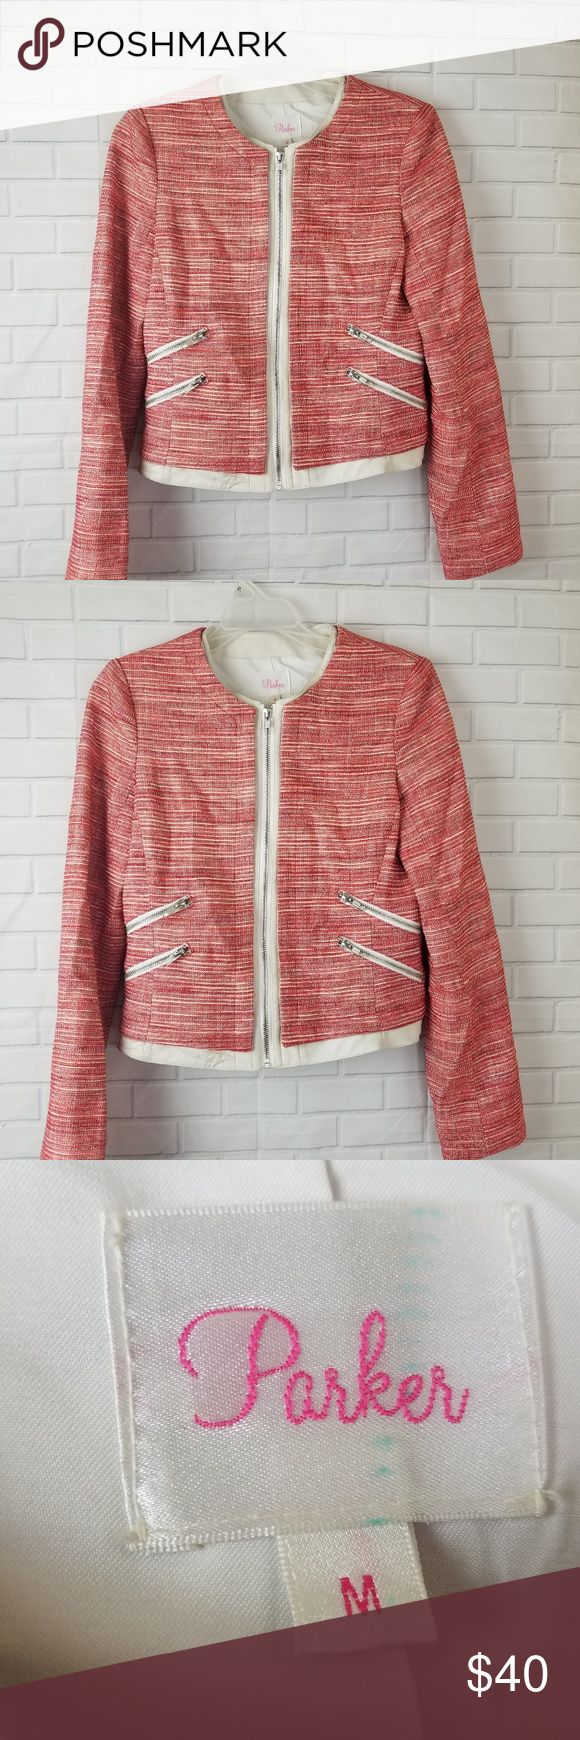 "Parker jacket blazer zip up pink red Medium parker womens jacker blazer zip up with faux trim leather red pink ivory  Armpit to Armpit: 17"" Total Lentgh: 19"" Sleeve: 24"" CL Parker Jackets & Coats Blazers"